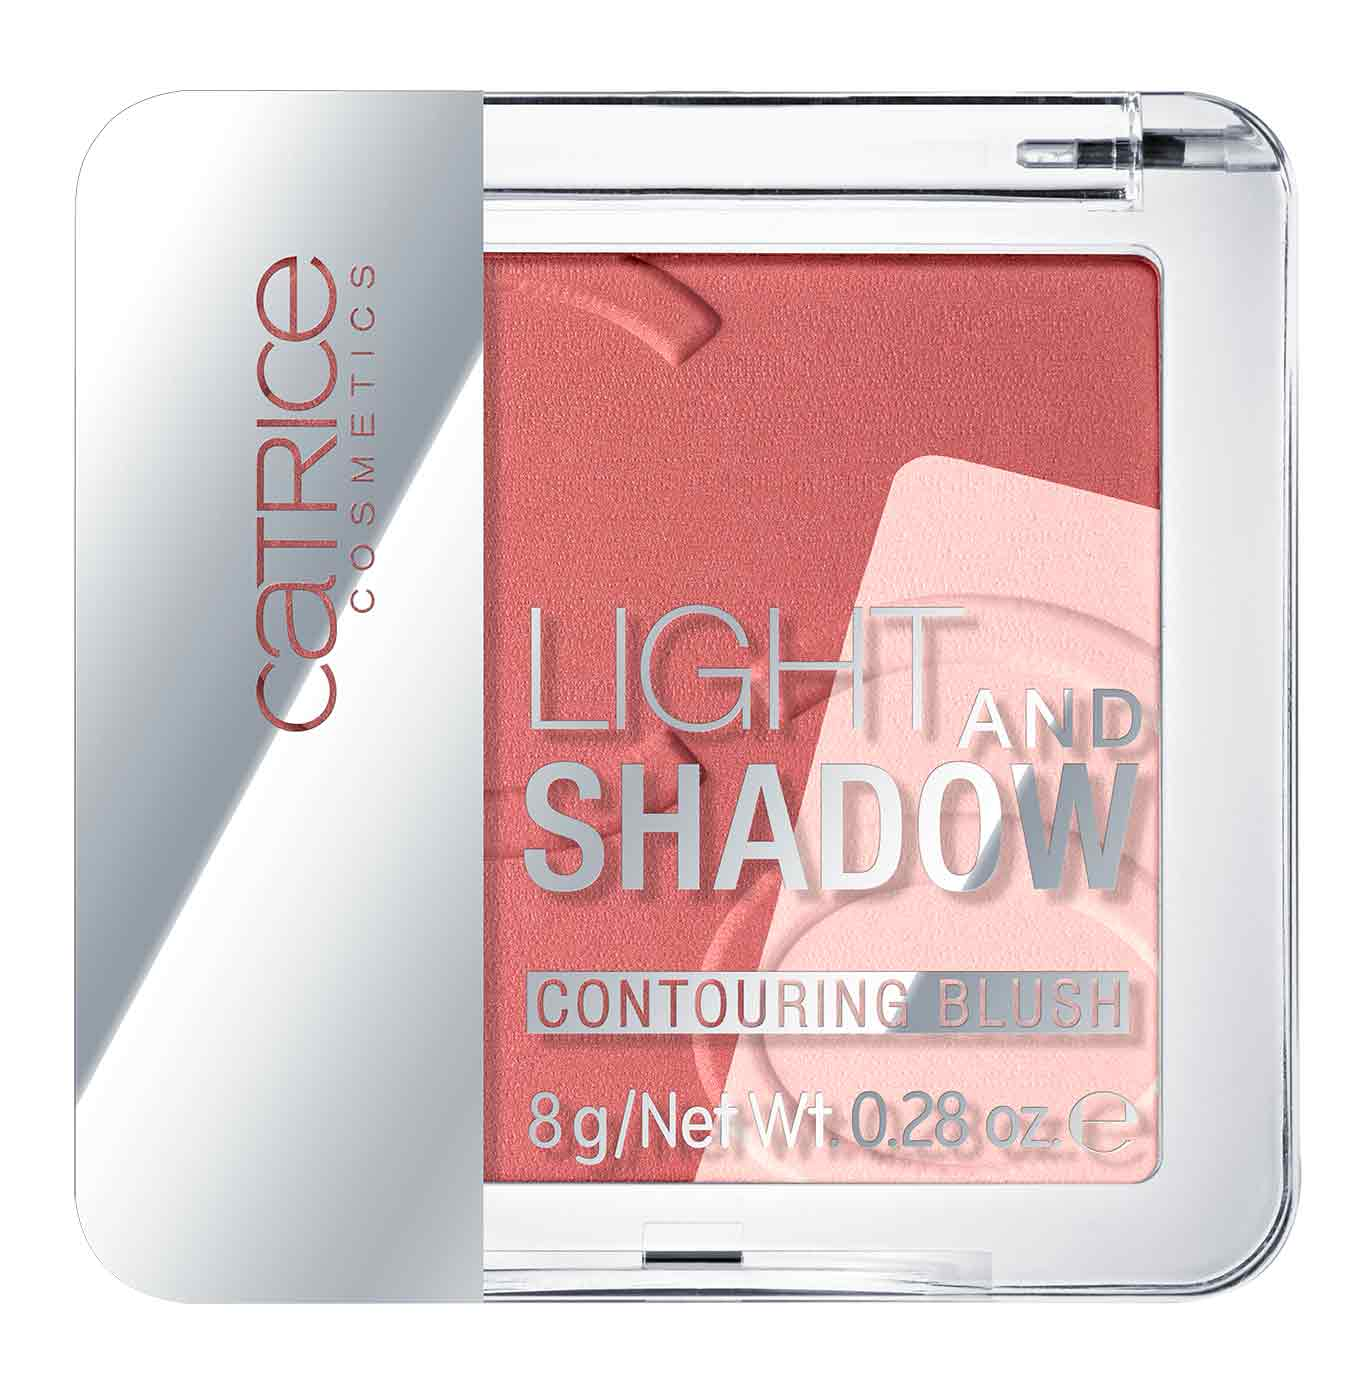 catr_light-shadow-contouring-blush_030_1477492363